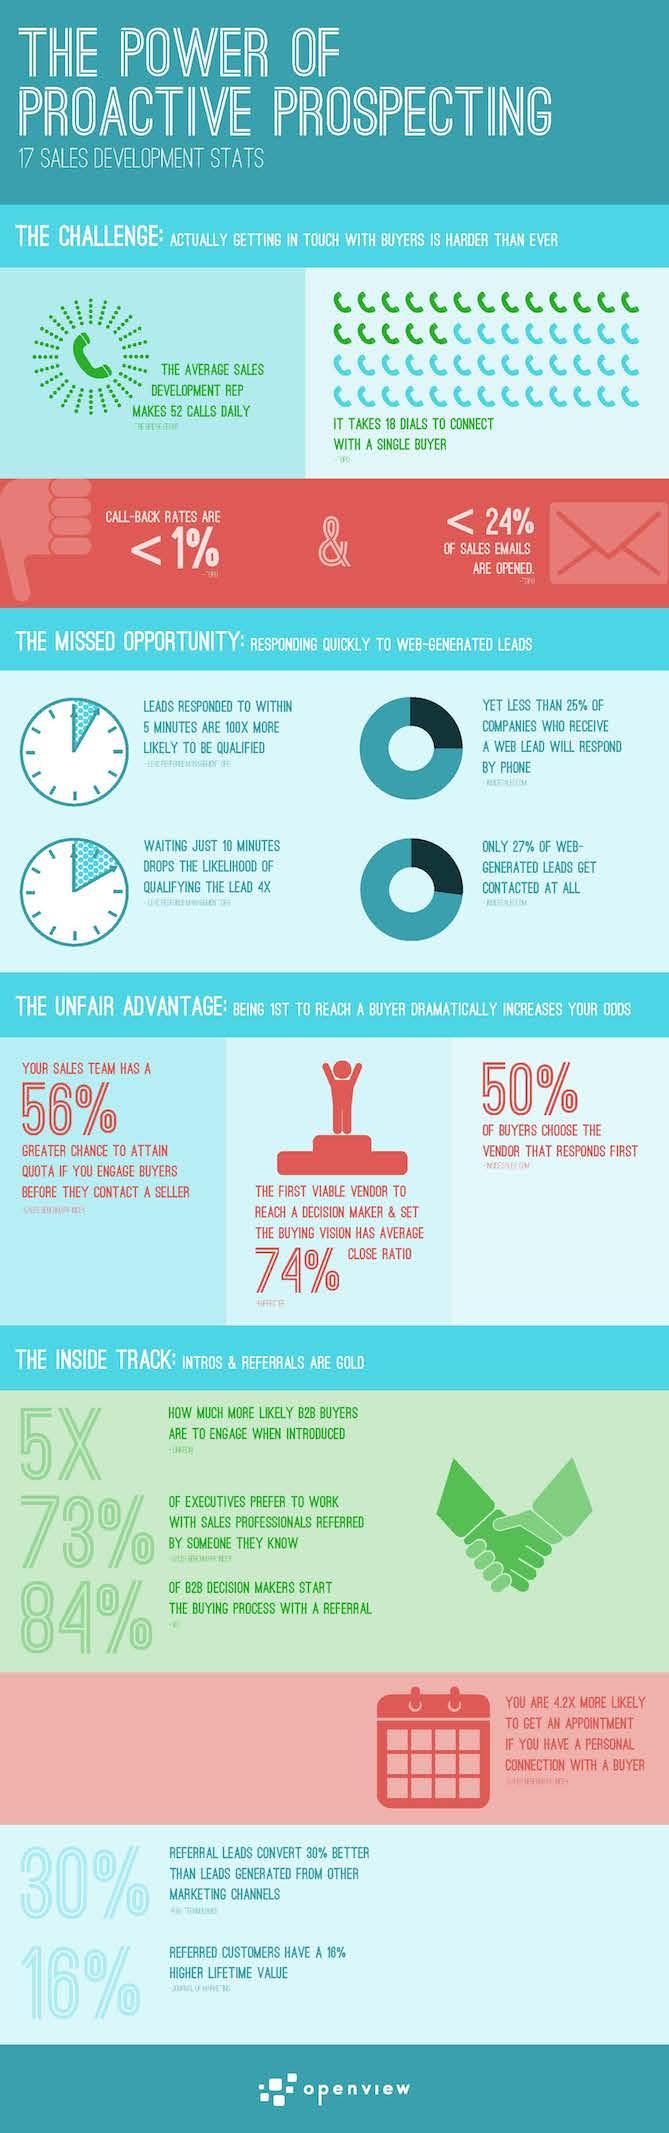 power-of-proactive-prospecting-infographic.jpg